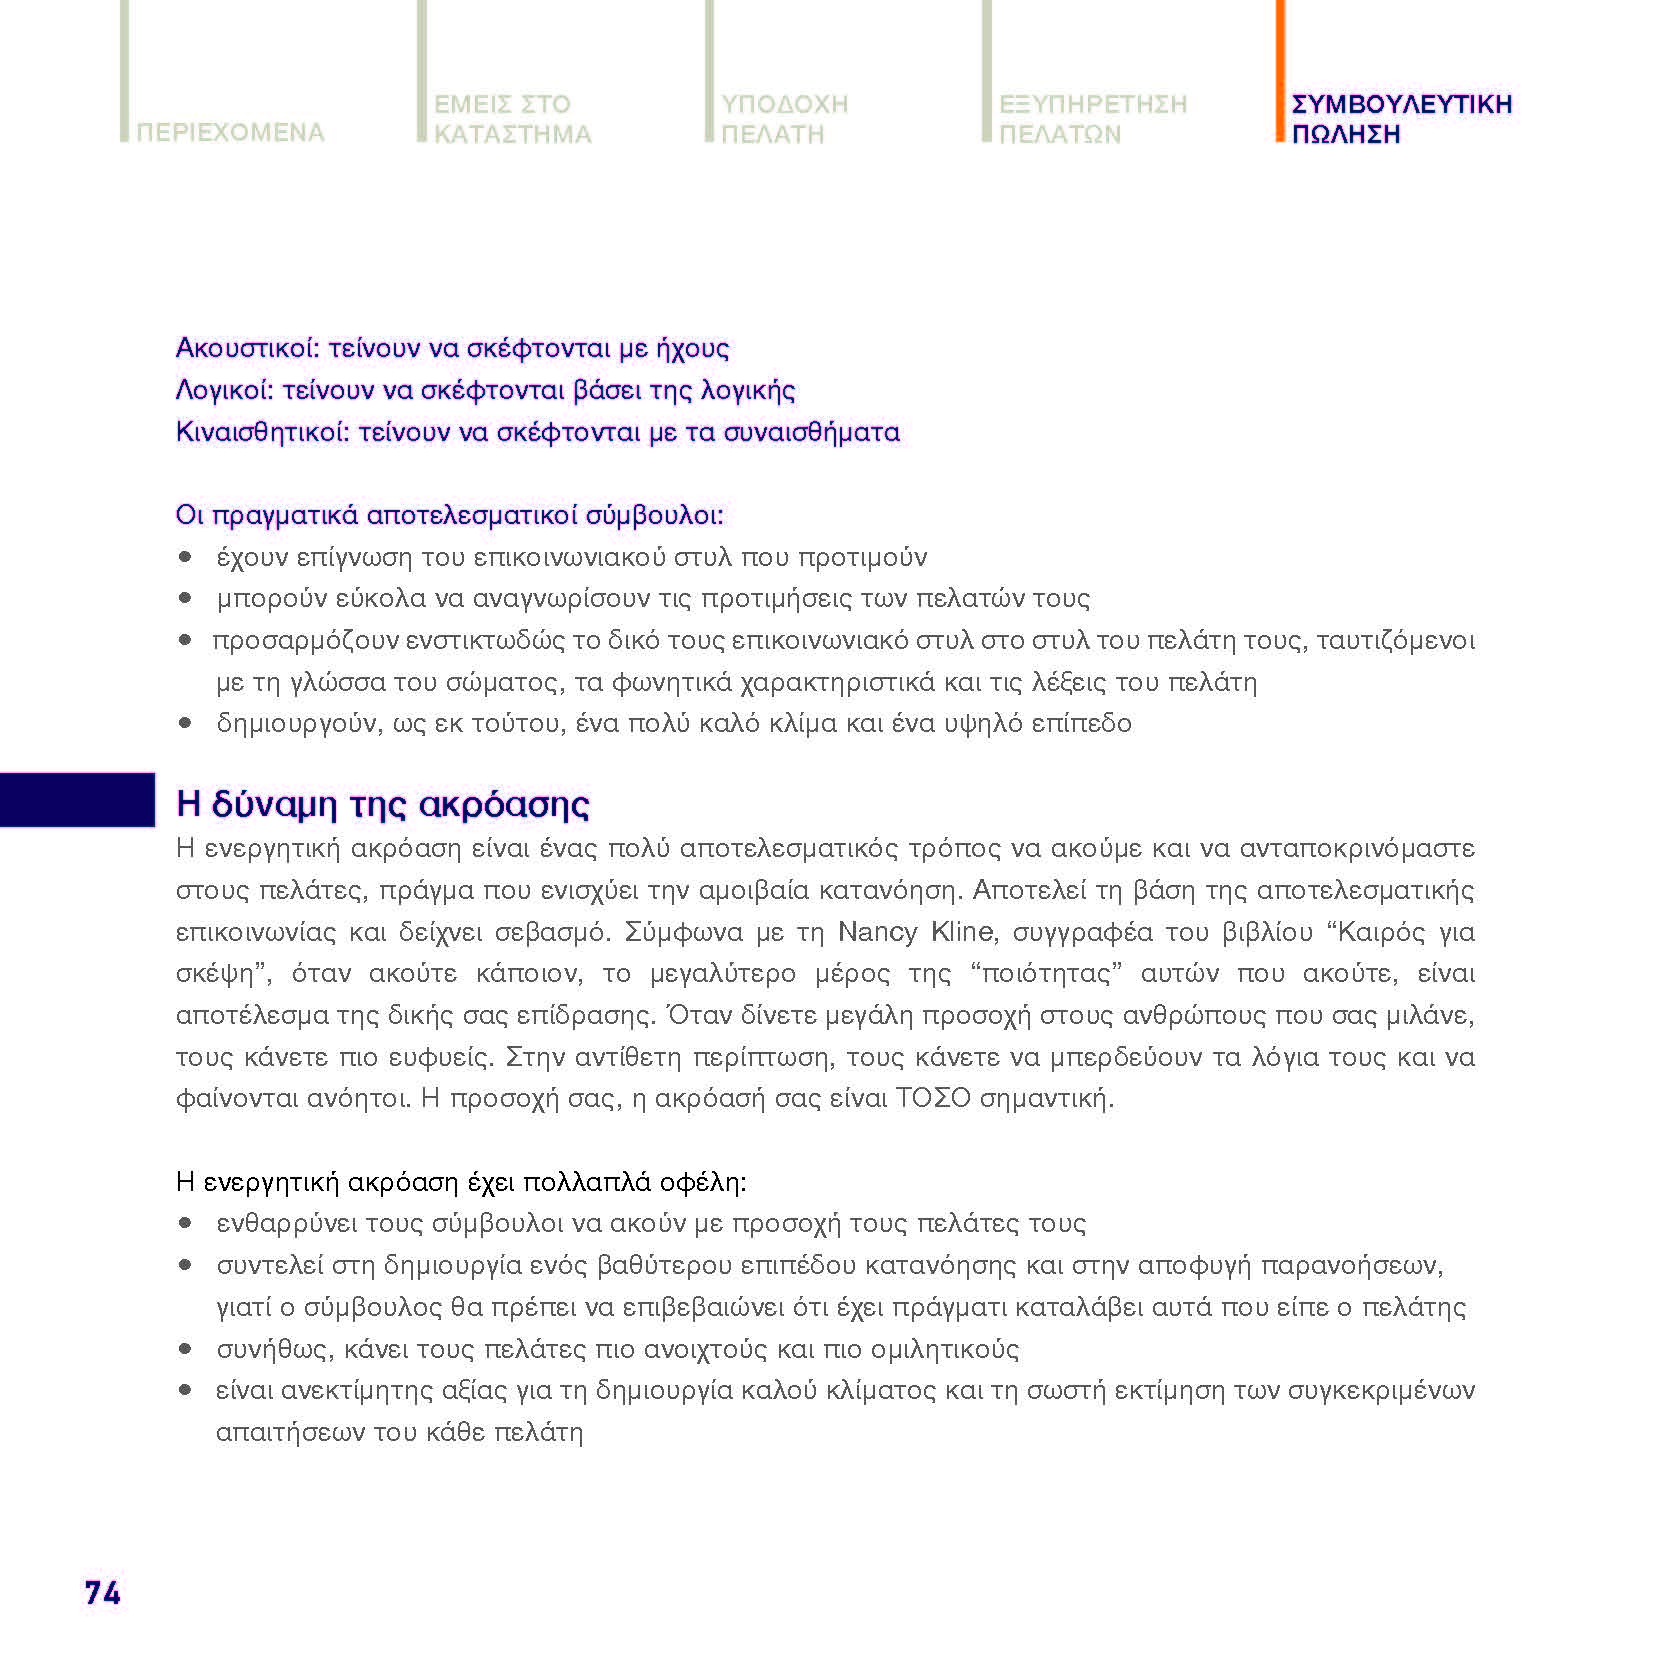 https://www.jib.gr/wp-content/uploads/2020/09/OPTIMA-BANK-BOOKLET-WEB_Page_074.jpg